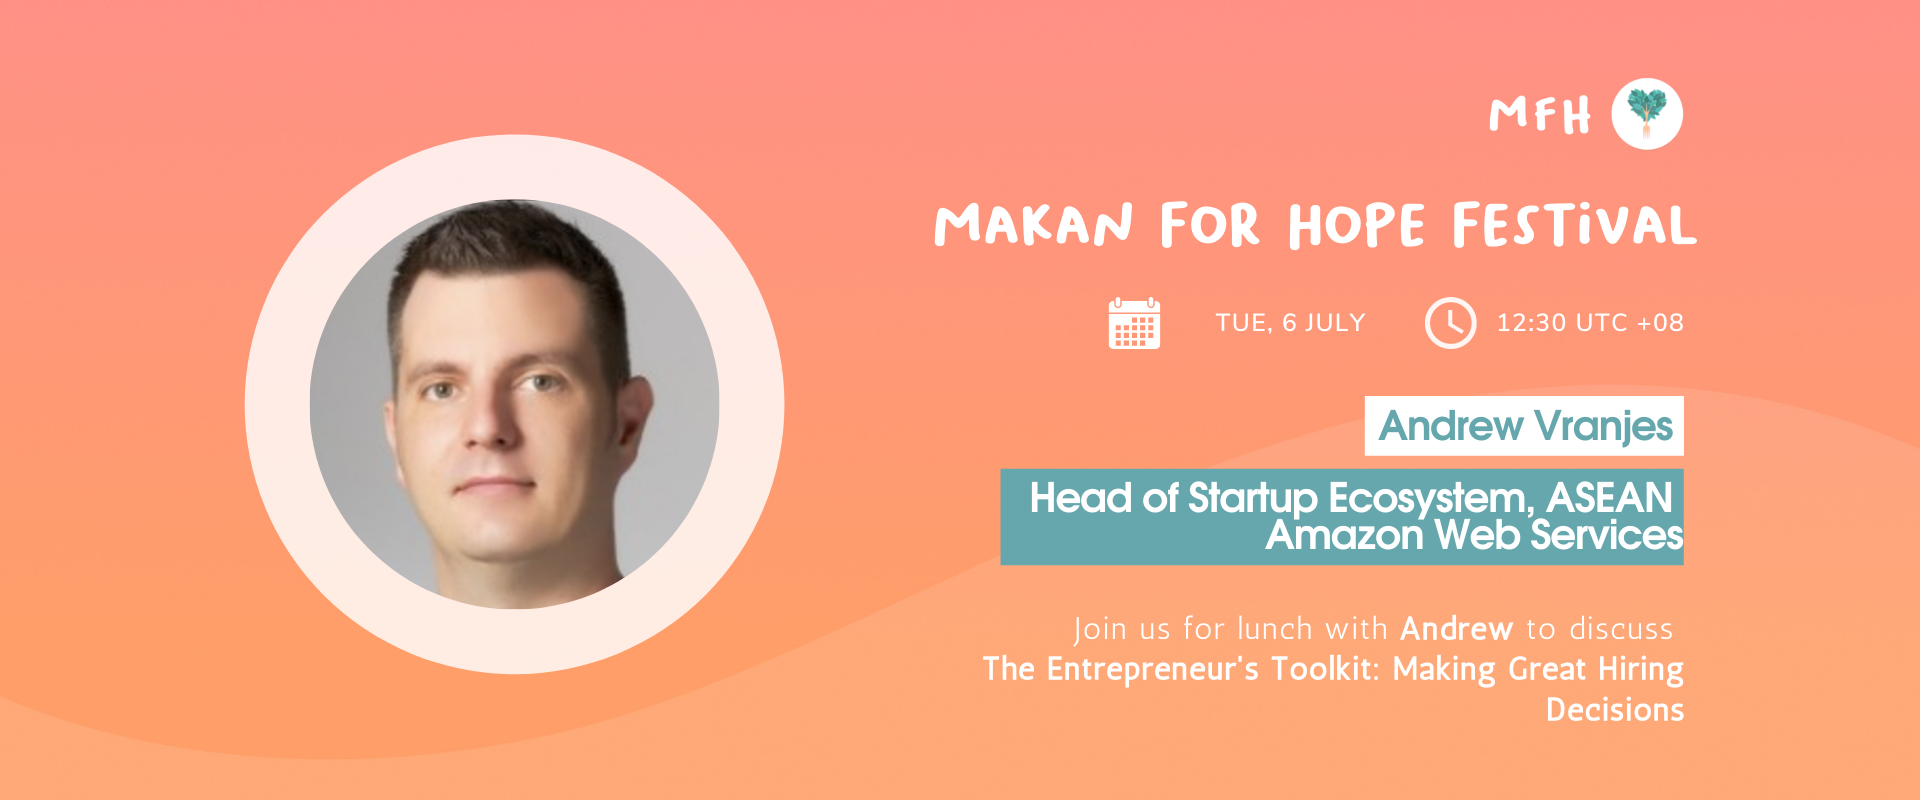 Andrew Vranjes - The Entrepreneur's Toolkit: Making Great Hiring Decisions